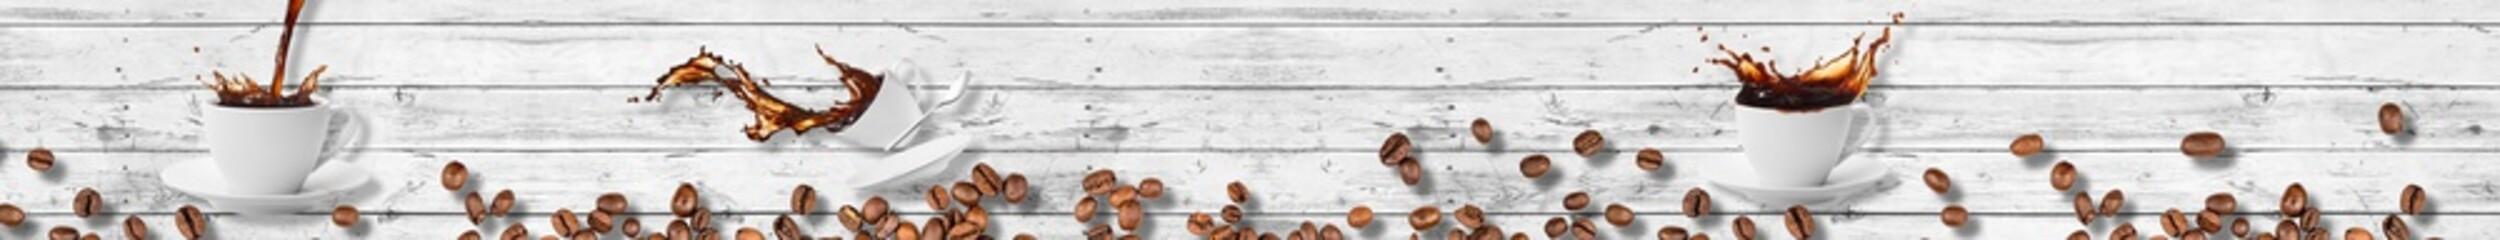 kawa z ziarnami na desce